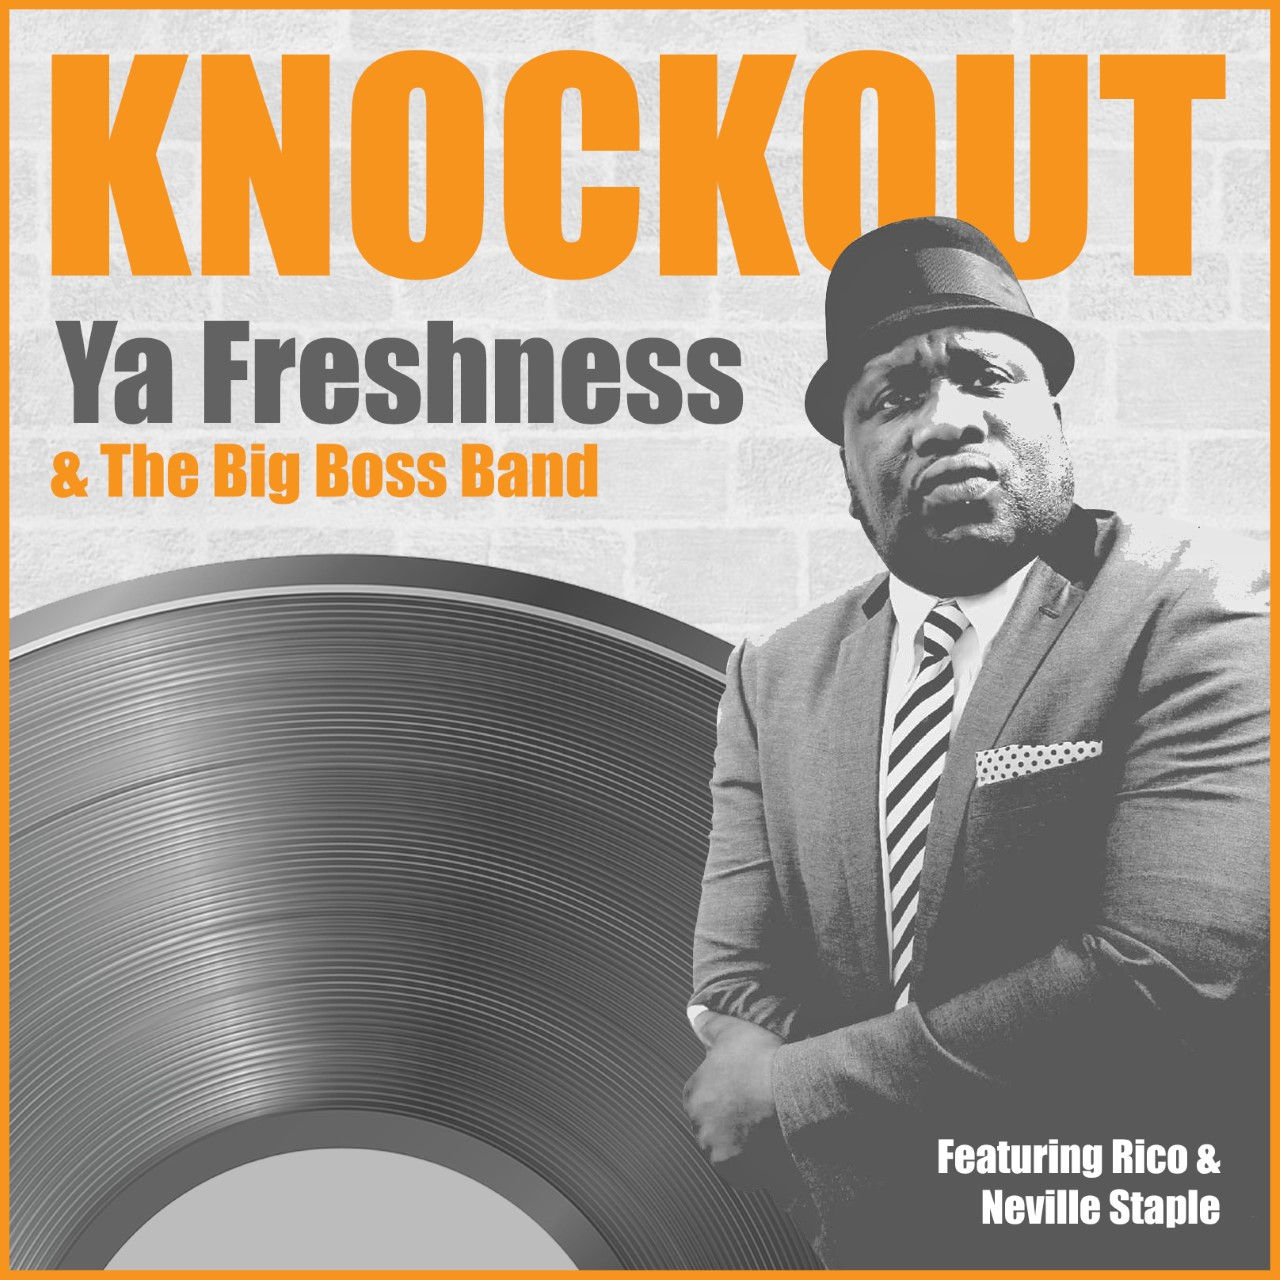 thumbnail_Knockout-Album-Cover_AW_V2